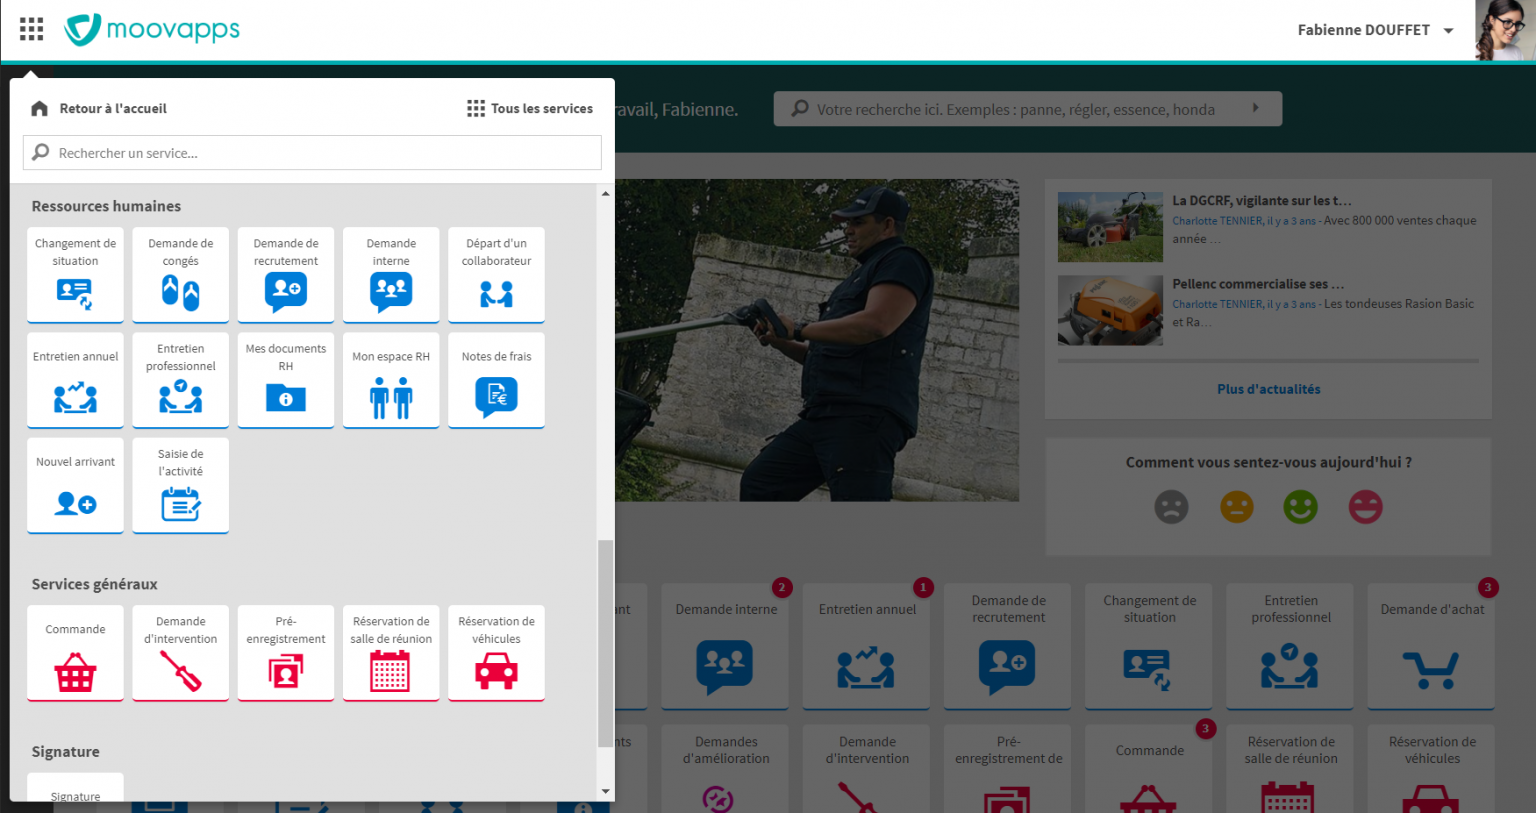 Avis Moovapps Employee Center : Adoptez un intranet collaboratif sur mesure - appvizer